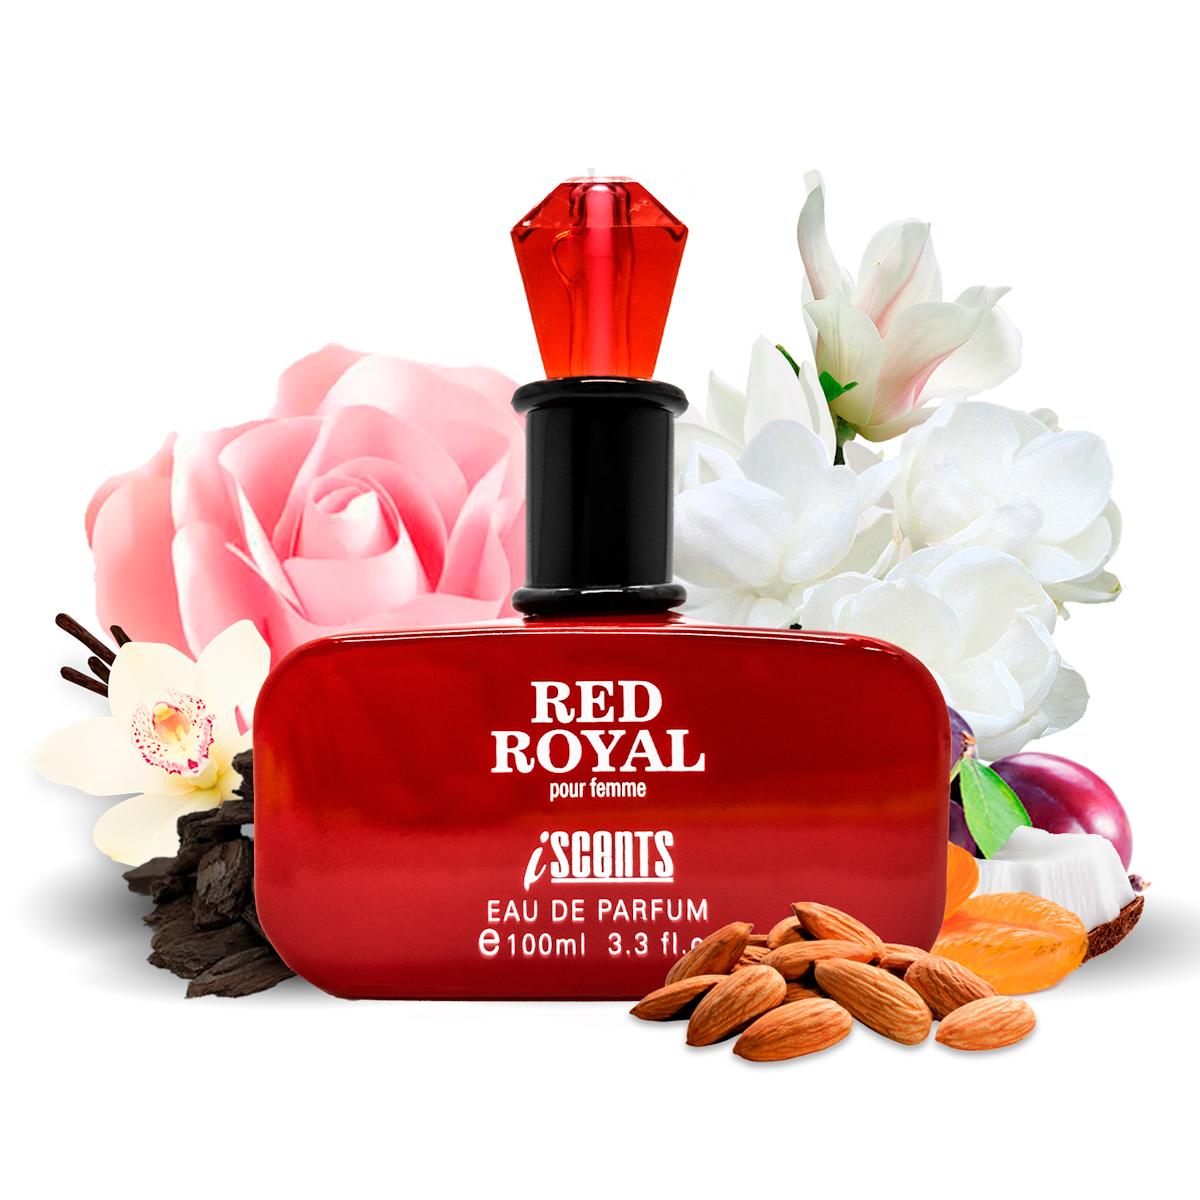 Kit 2 Perfumes Importados Red Royal e Dublin I Scents